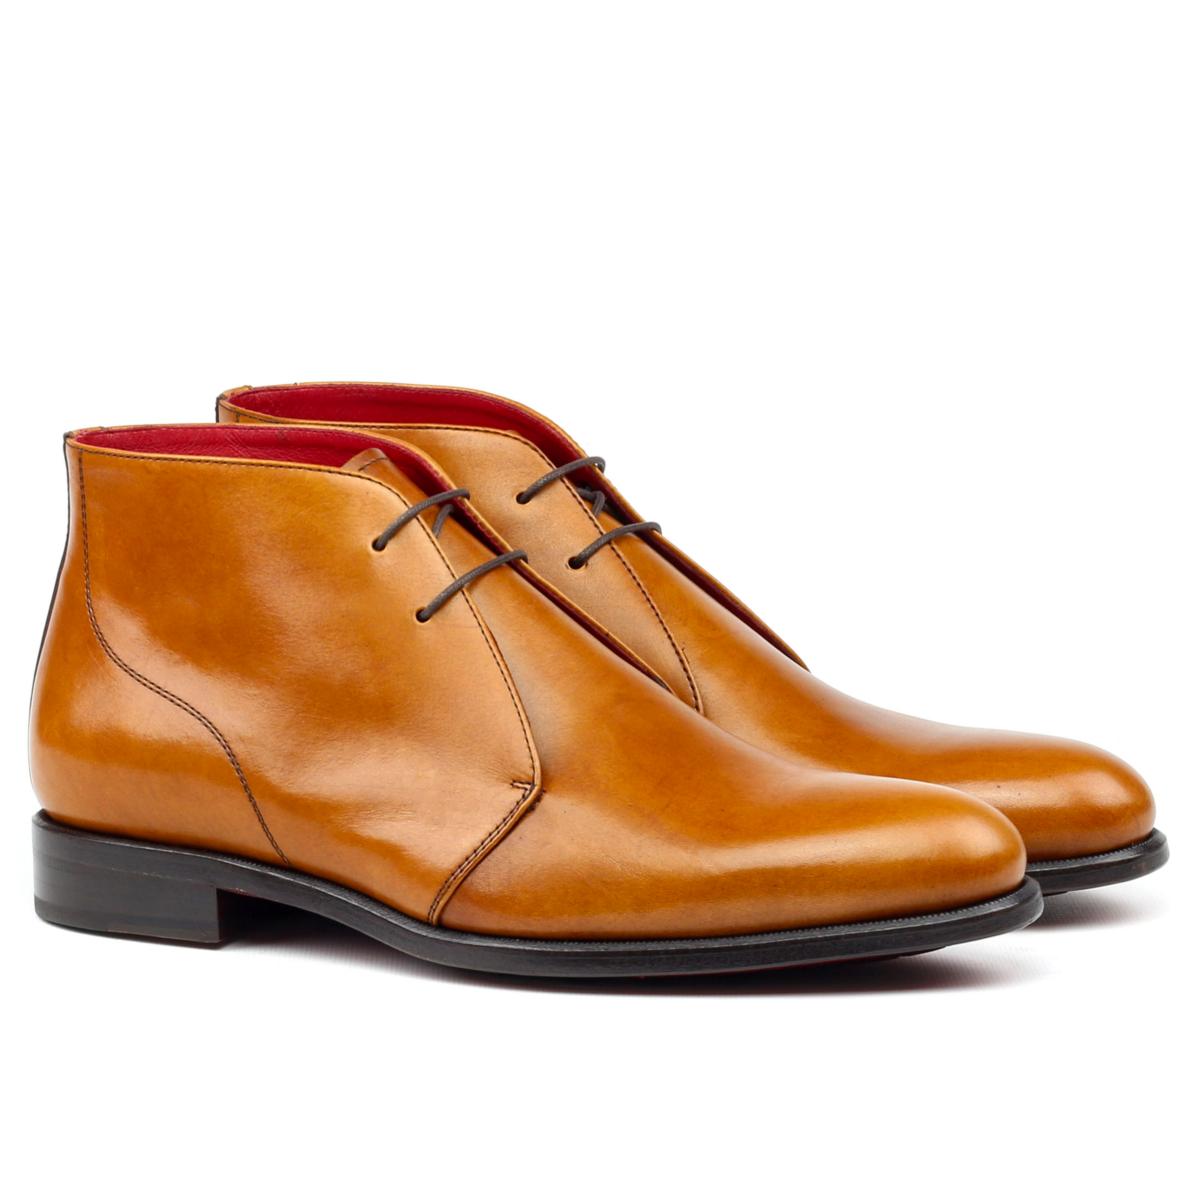 Chukka boot in cognac boxcalf